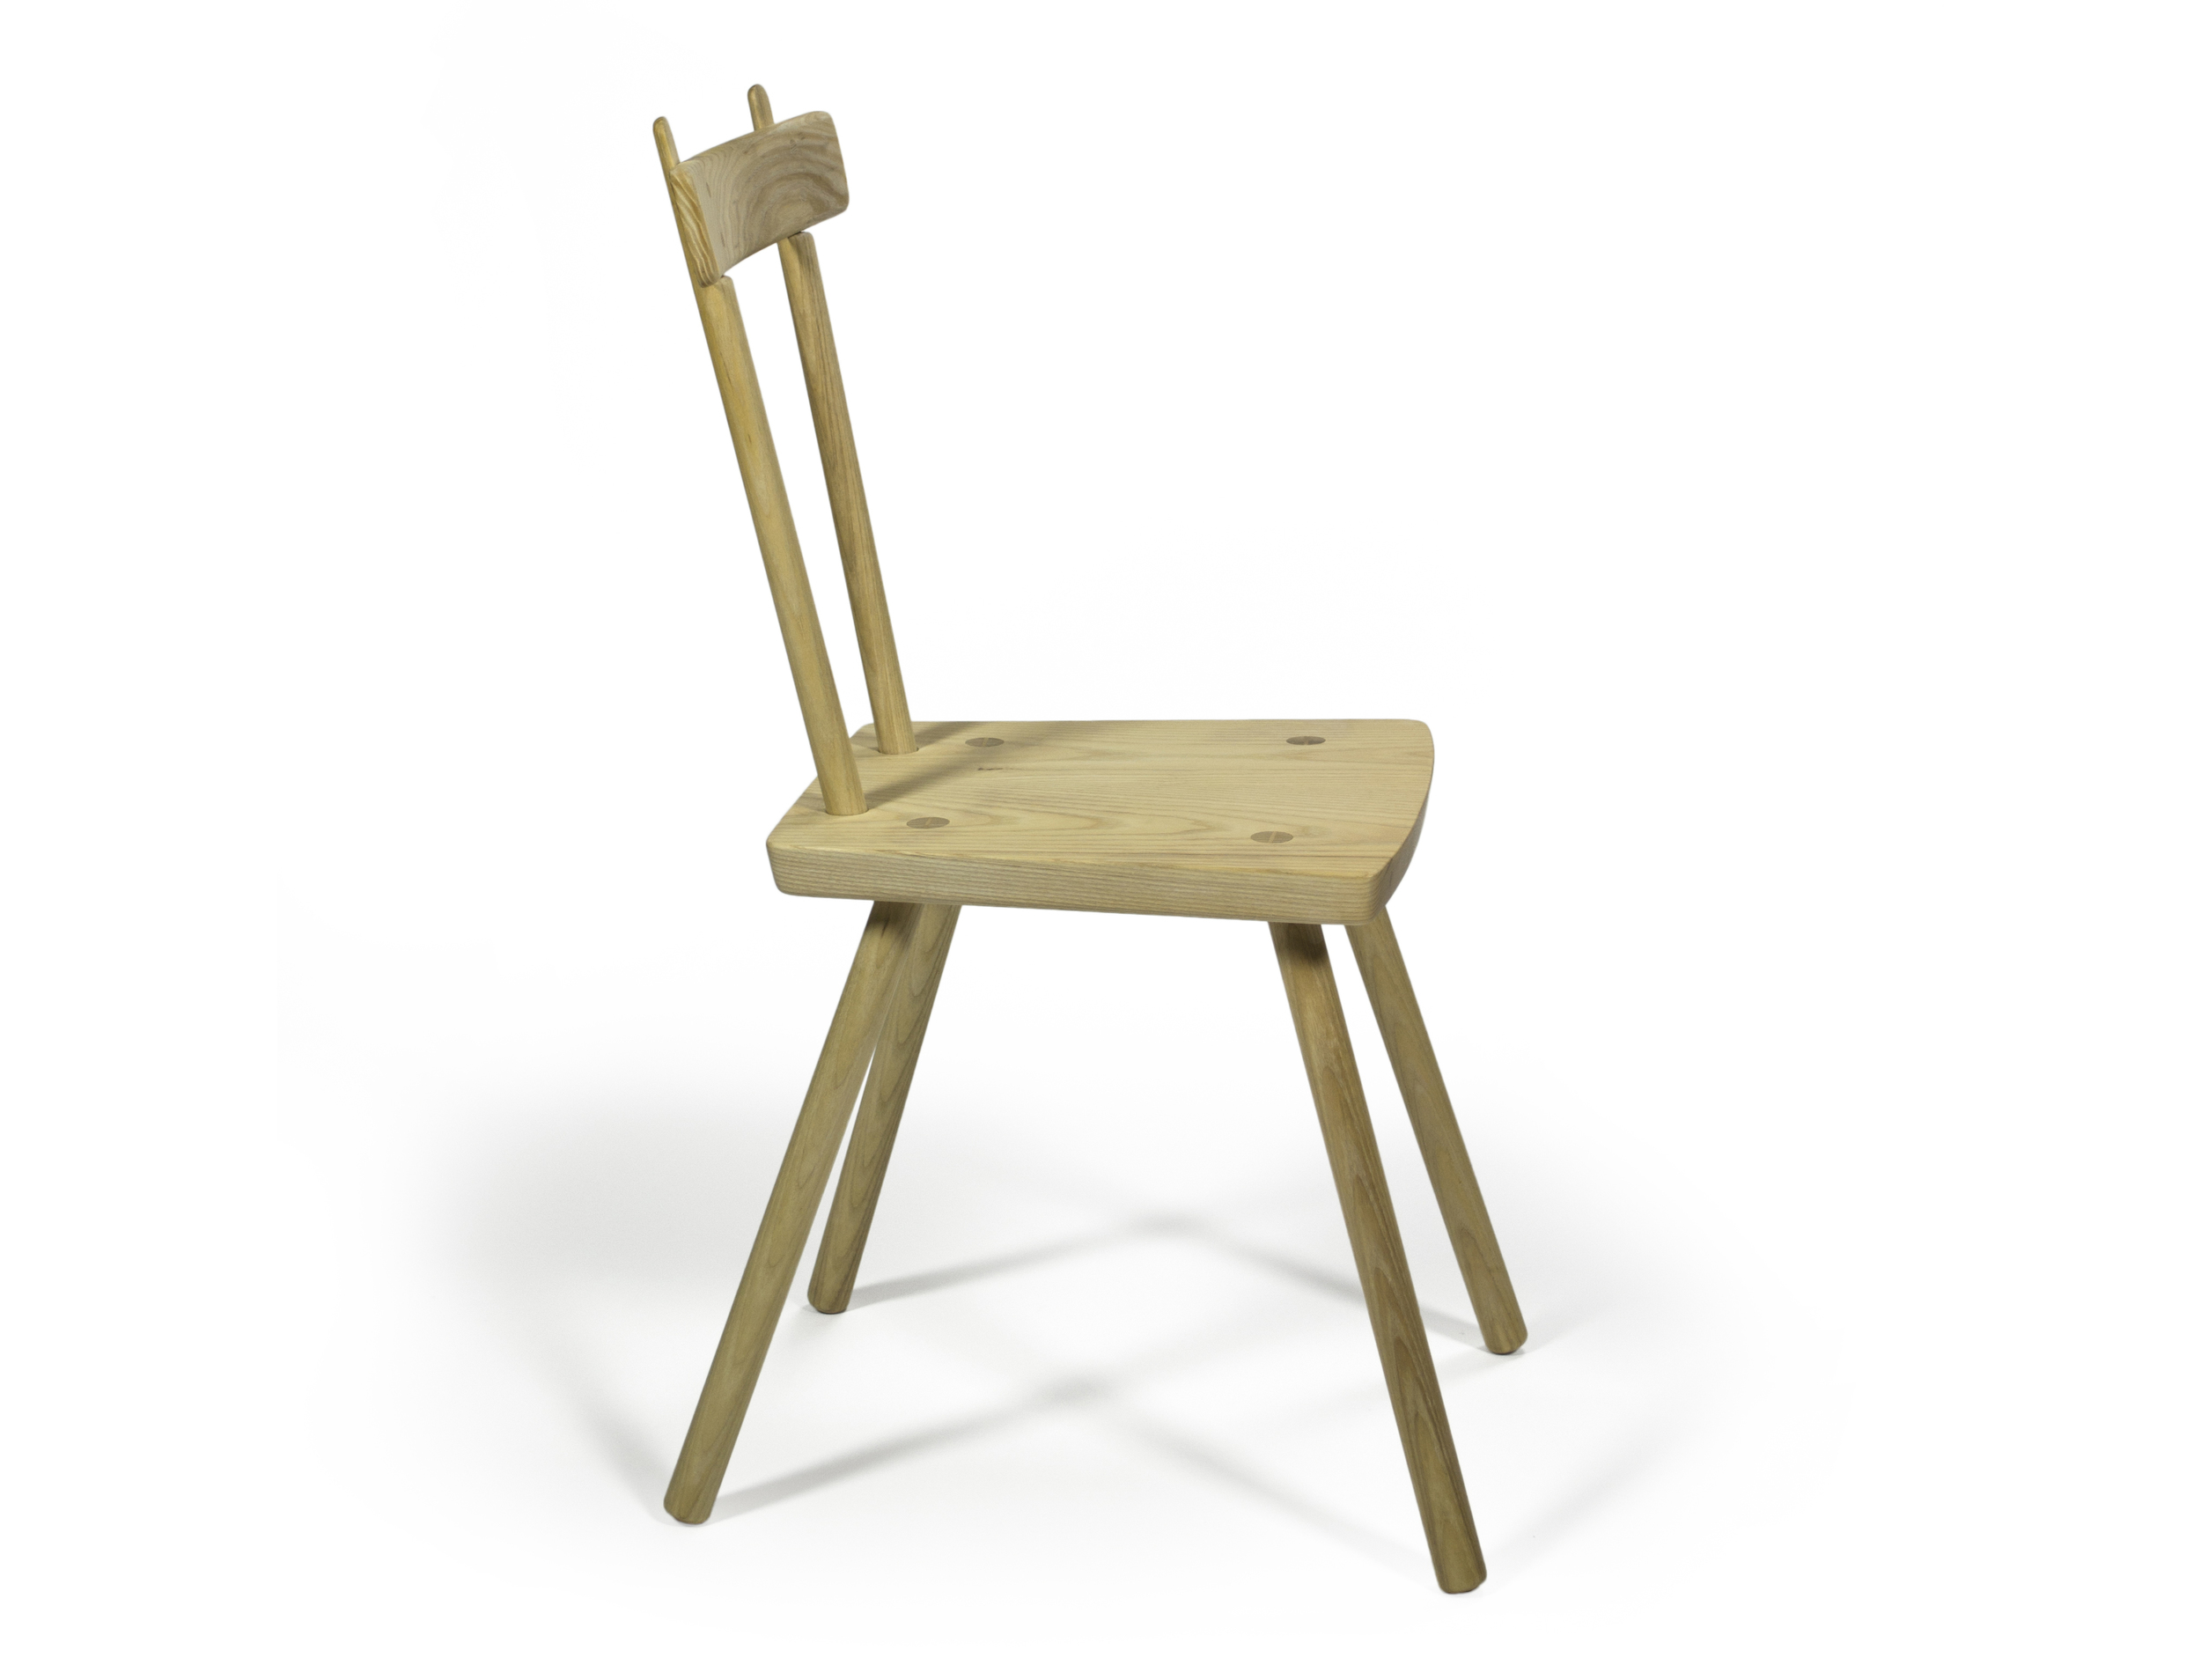 chair_sidecrop.jpg